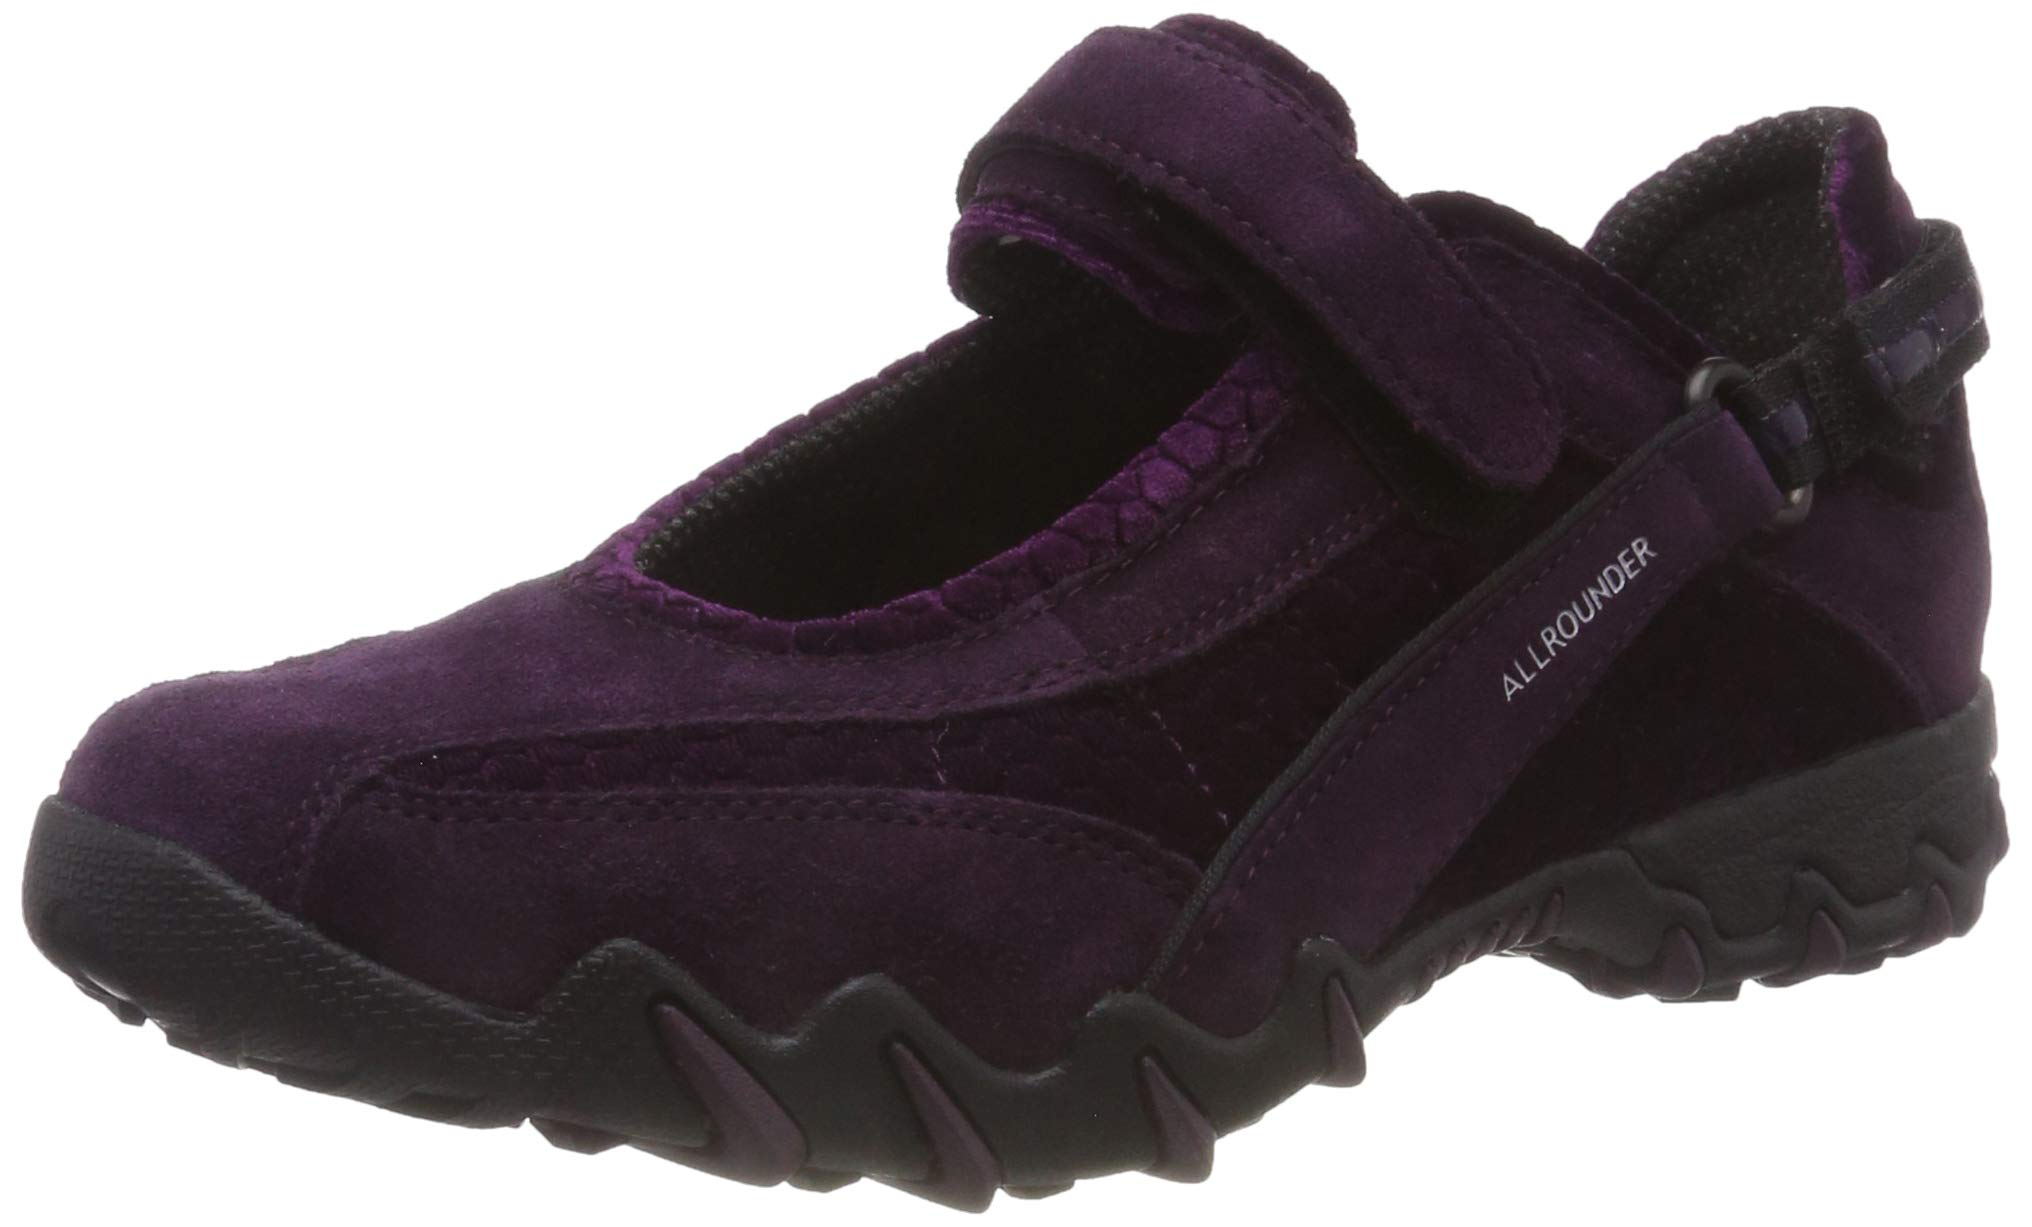 suede NiroChaussures De FemmeDk Mephisto Eu C H Allrounder soft Purple By 7239 Running c4Lj5A3Rq